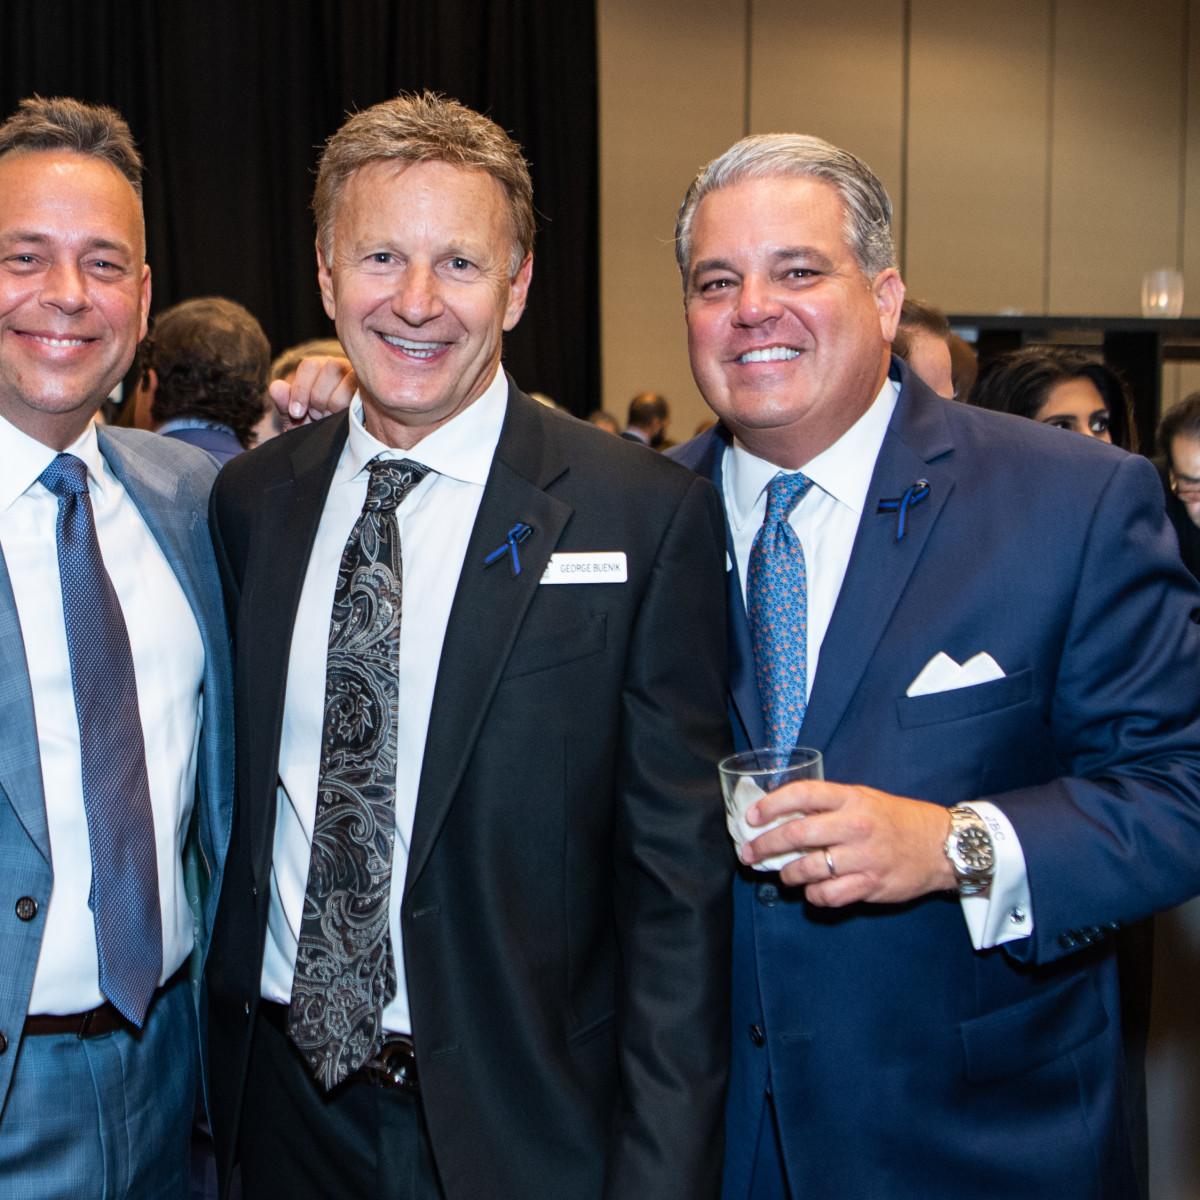 Crime Stoppers Gala 2019 HPD Commander Jim Dale, George Buenik, John Crapitto